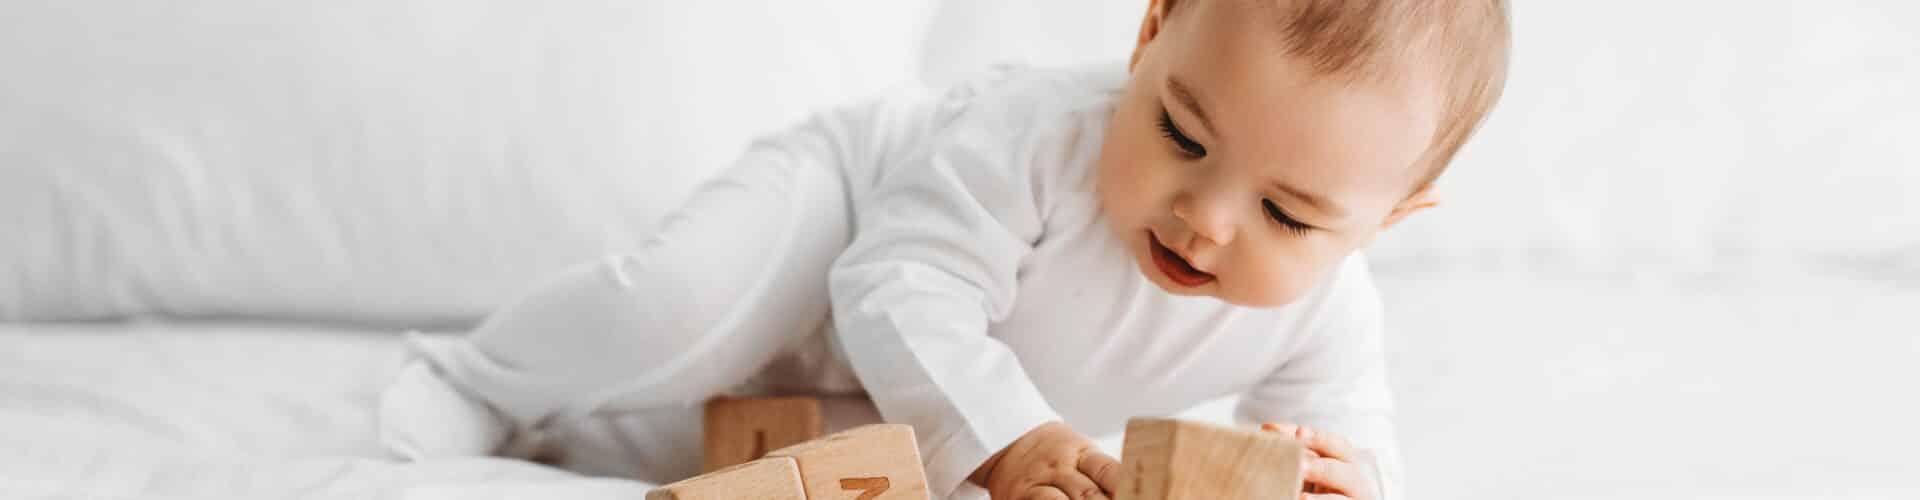 Eczema Baby Clothing